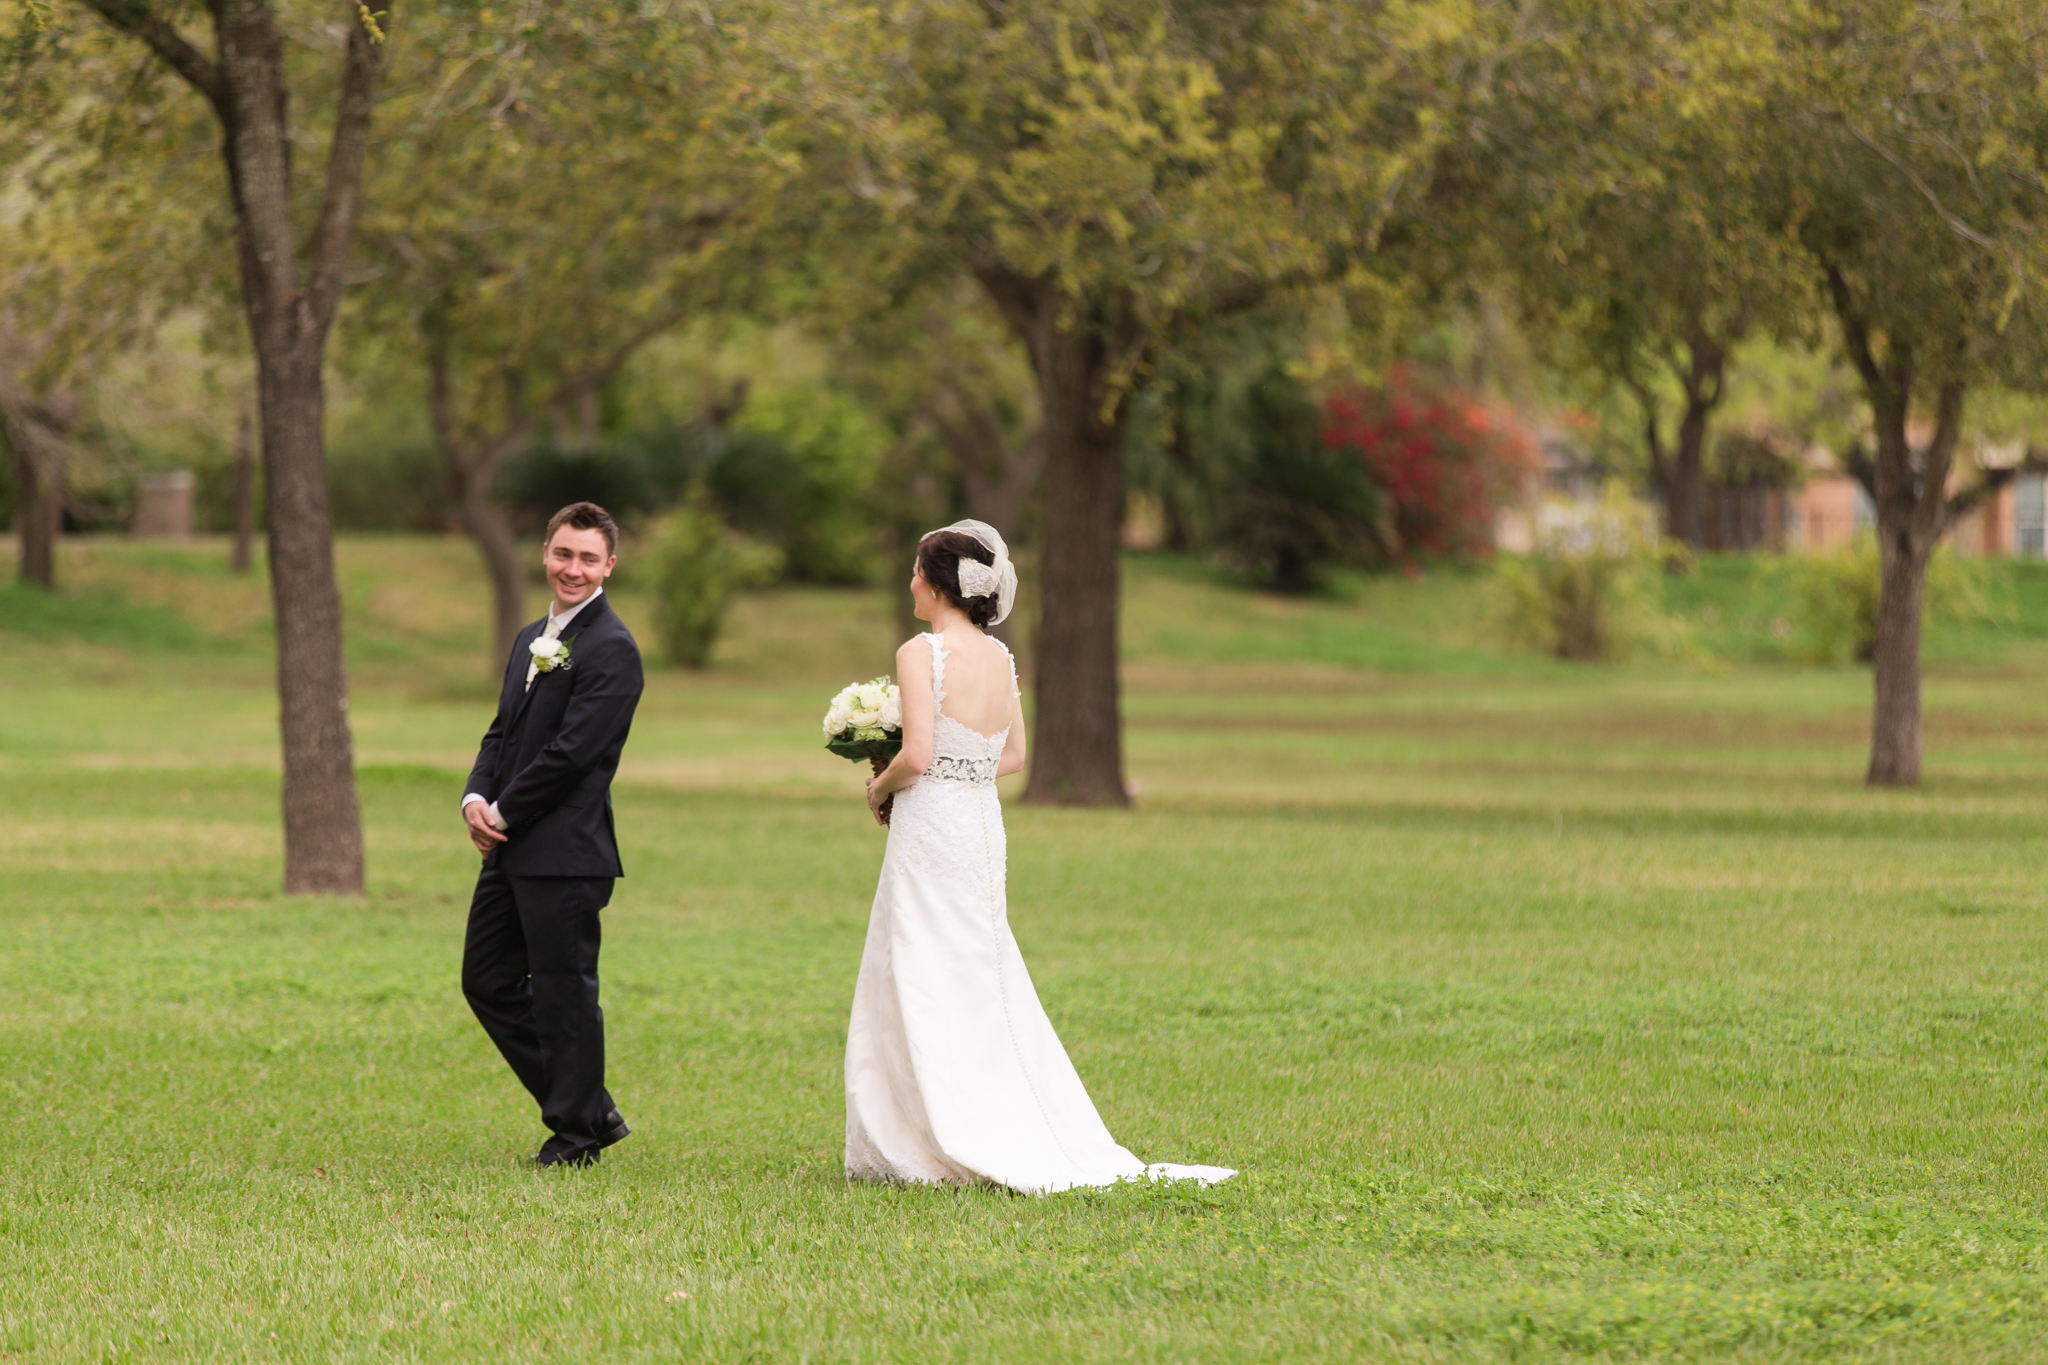 Ashley-Amber-Photo-Outdoor-Wedding-Photography-113751.jpg